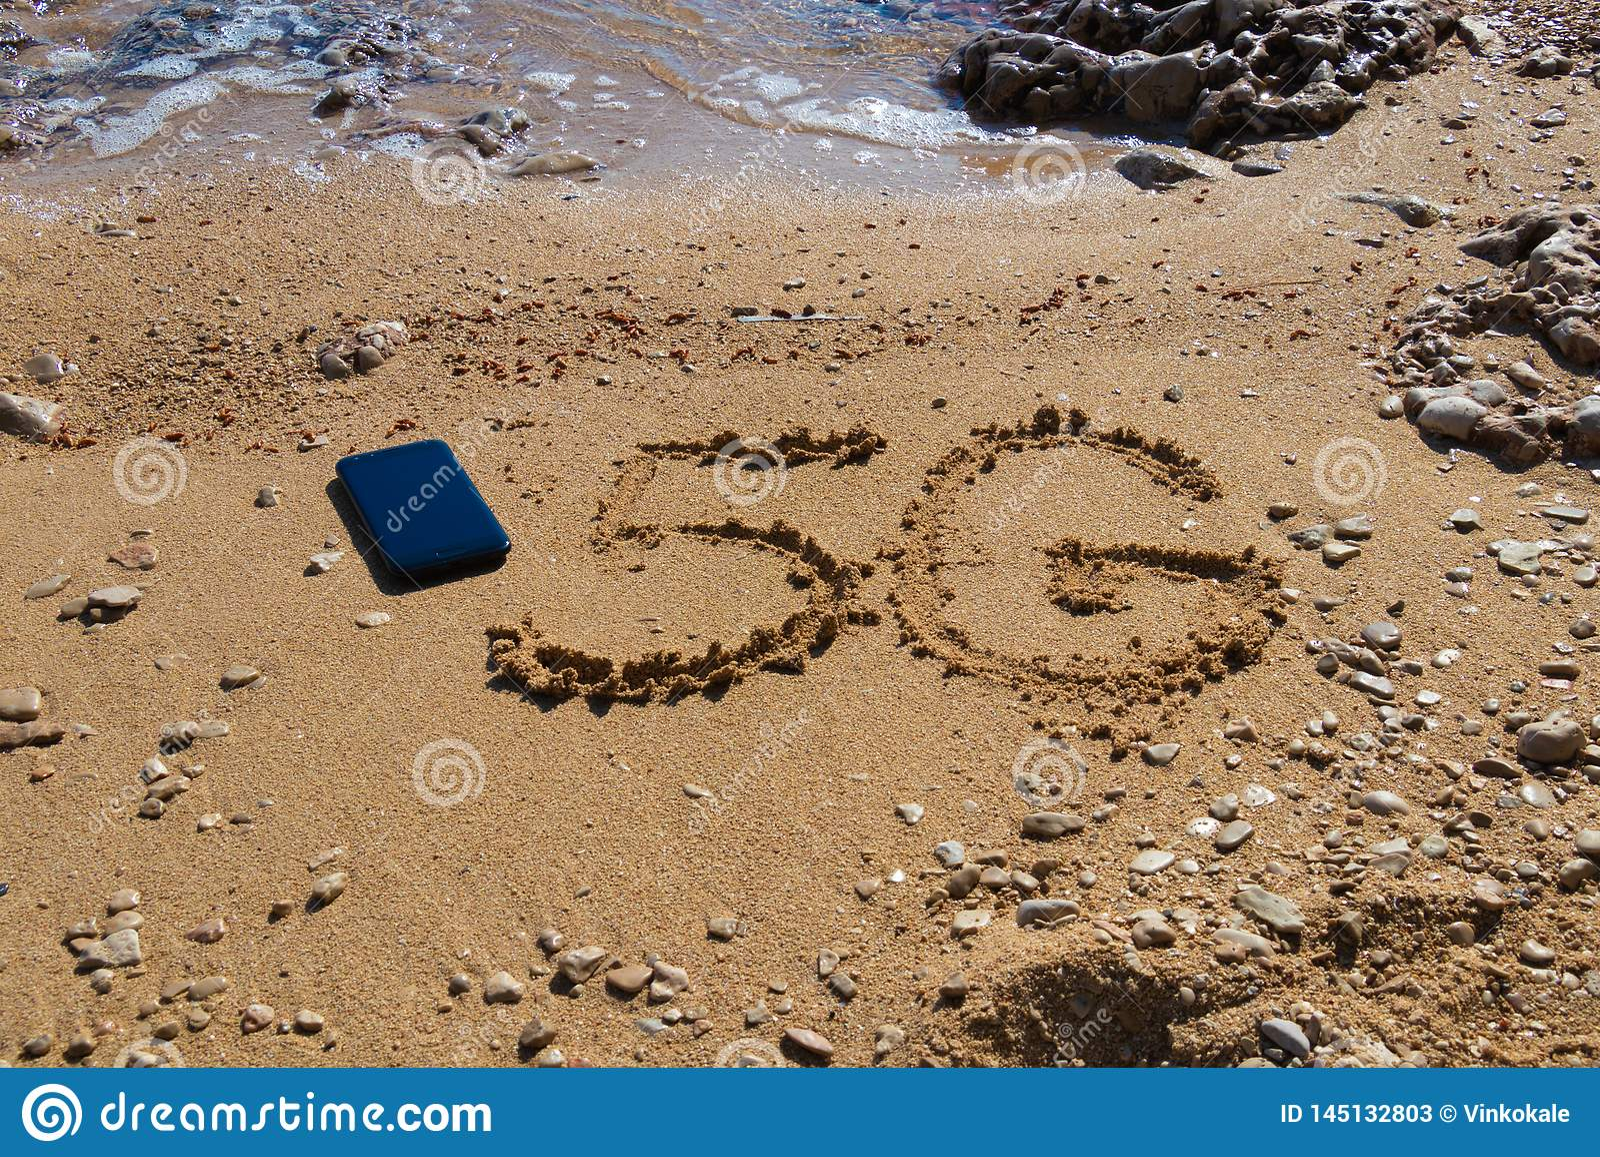 Form 5G auf dem Sand nahe Mobiltelefon